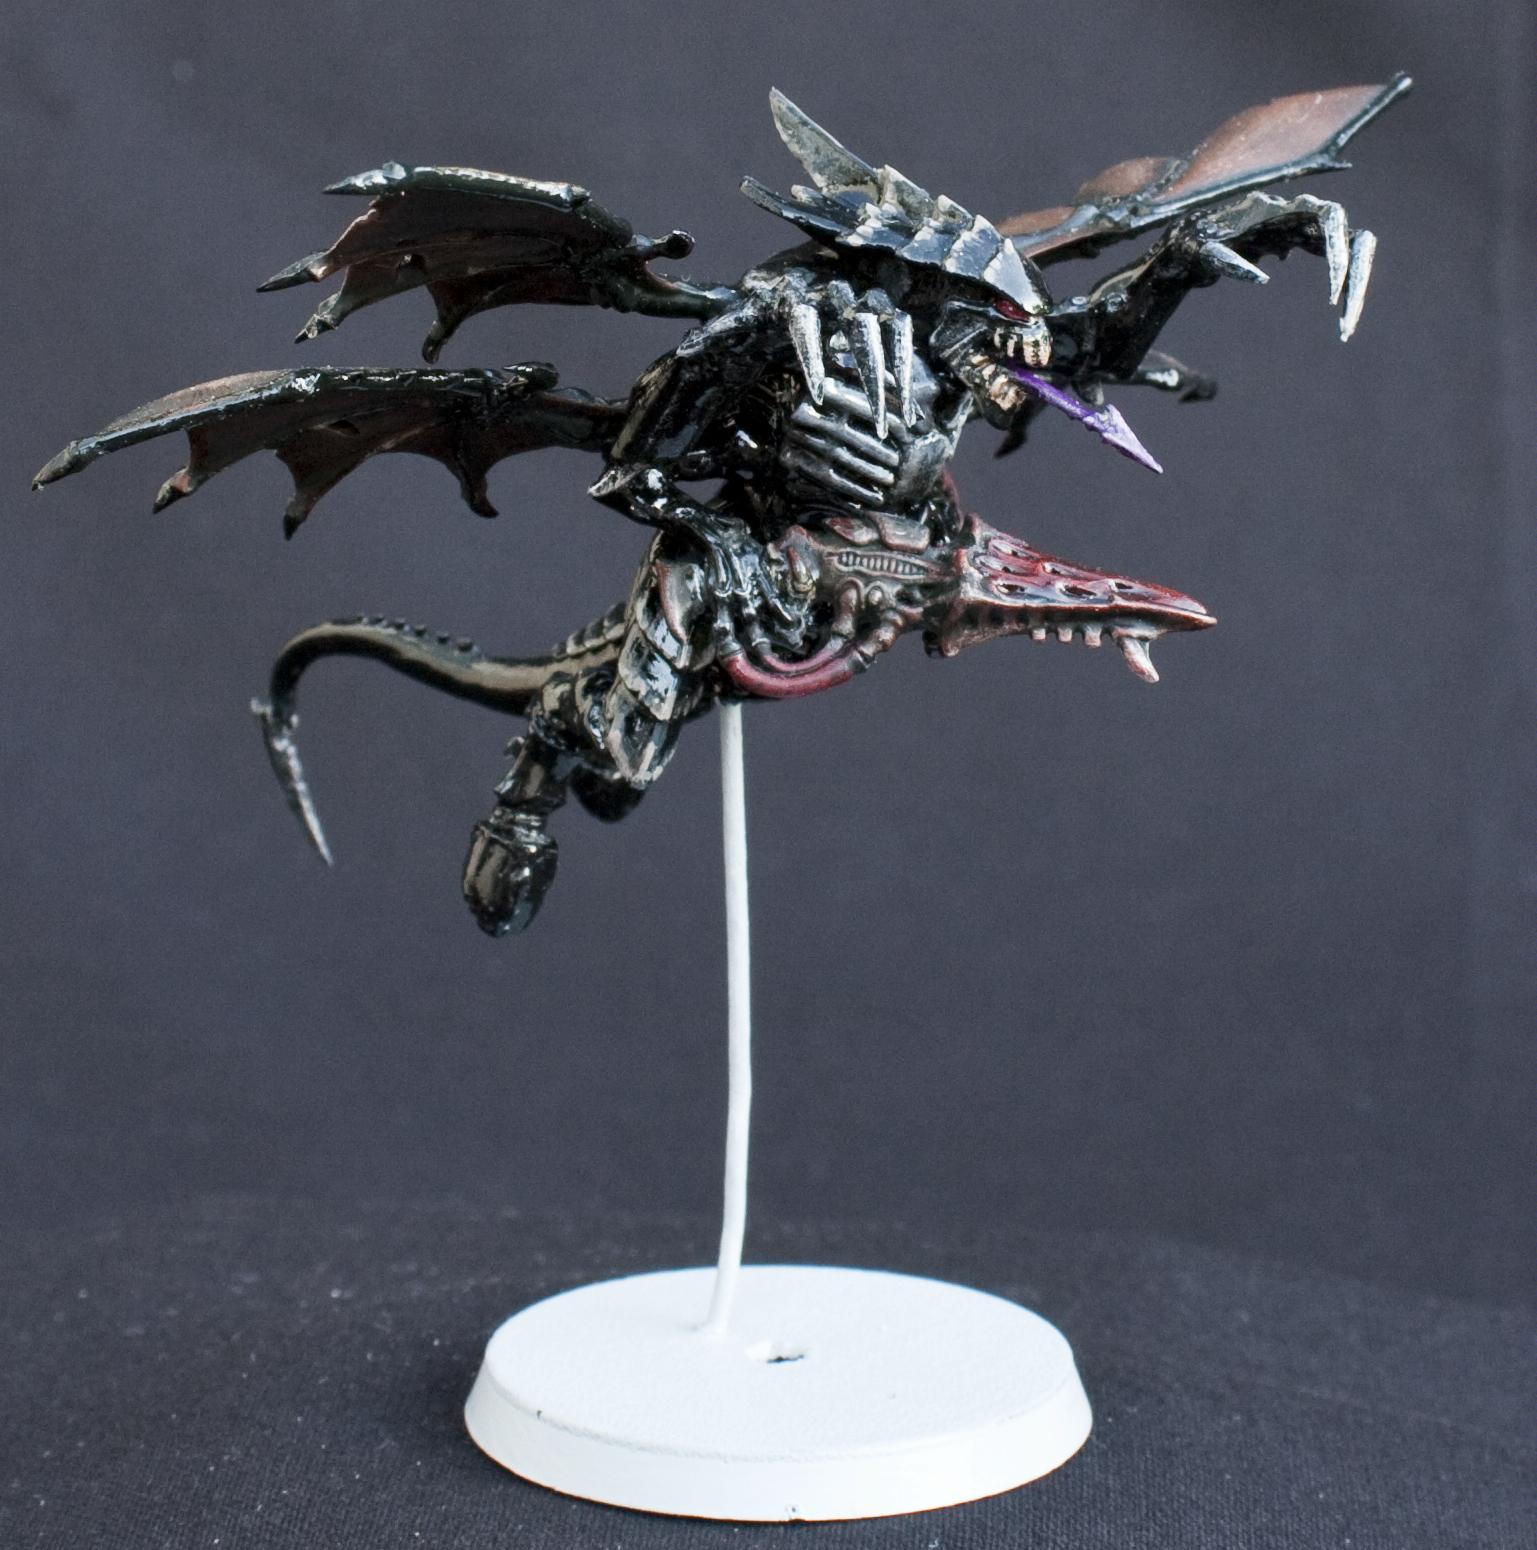 Black, Conversion, Flying, Glossy, Shrike, Shrikes, Tyranids, Warhammer 40,000, Winged